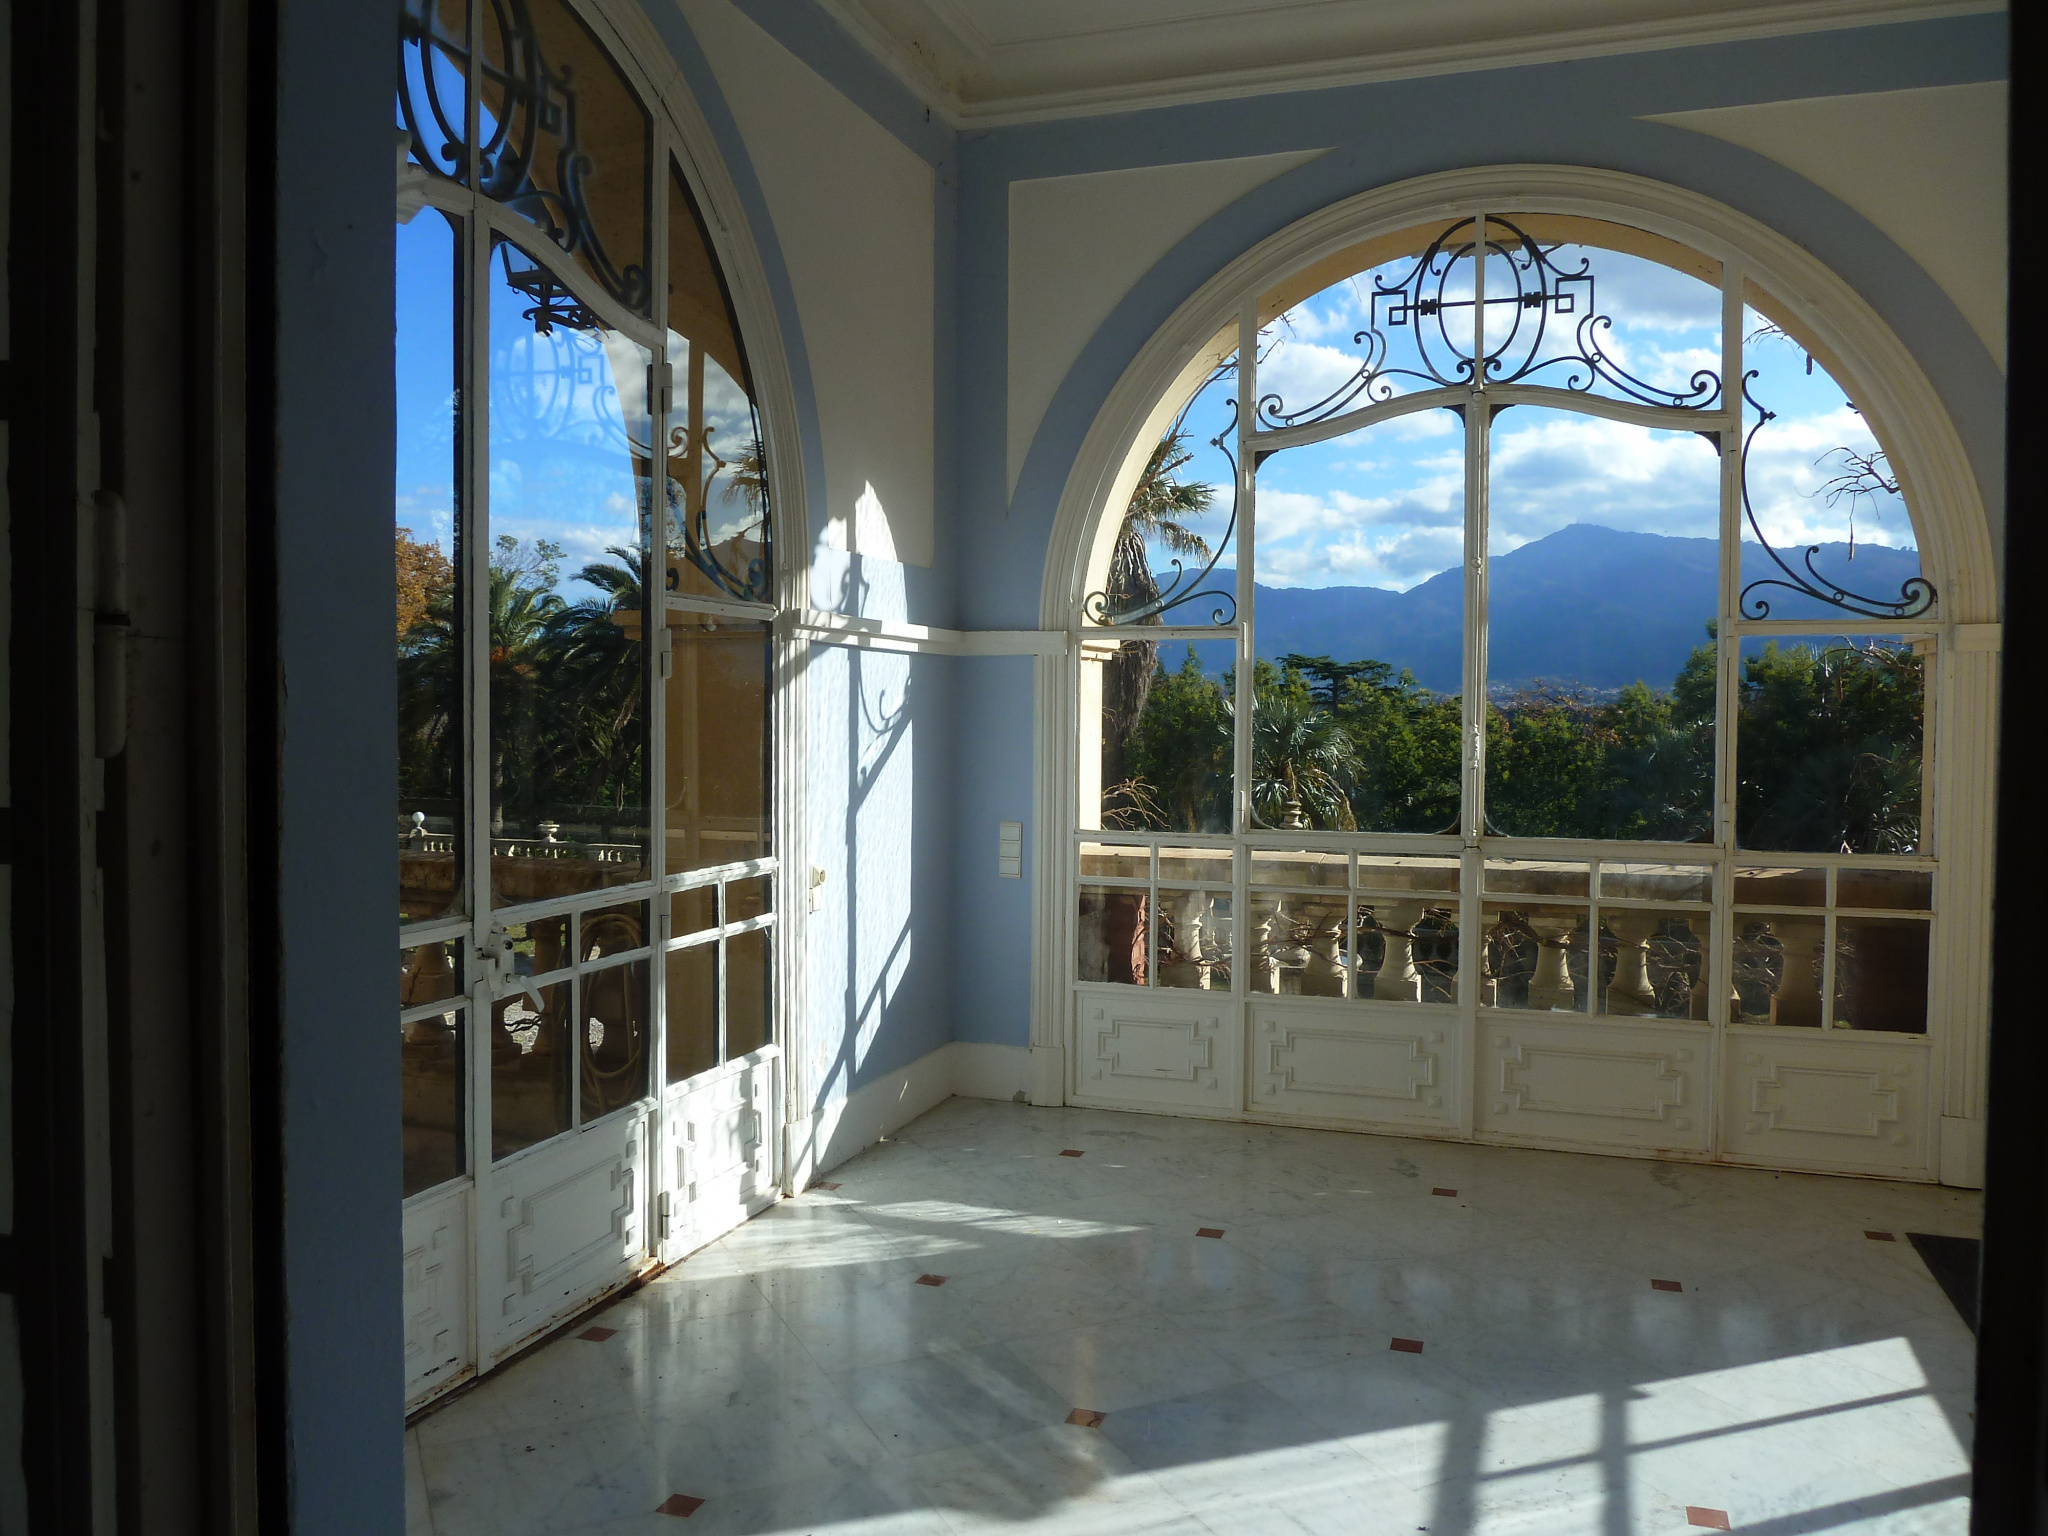 À vendre chateau de 760m2 à brouilla (66620) - Photo 3'